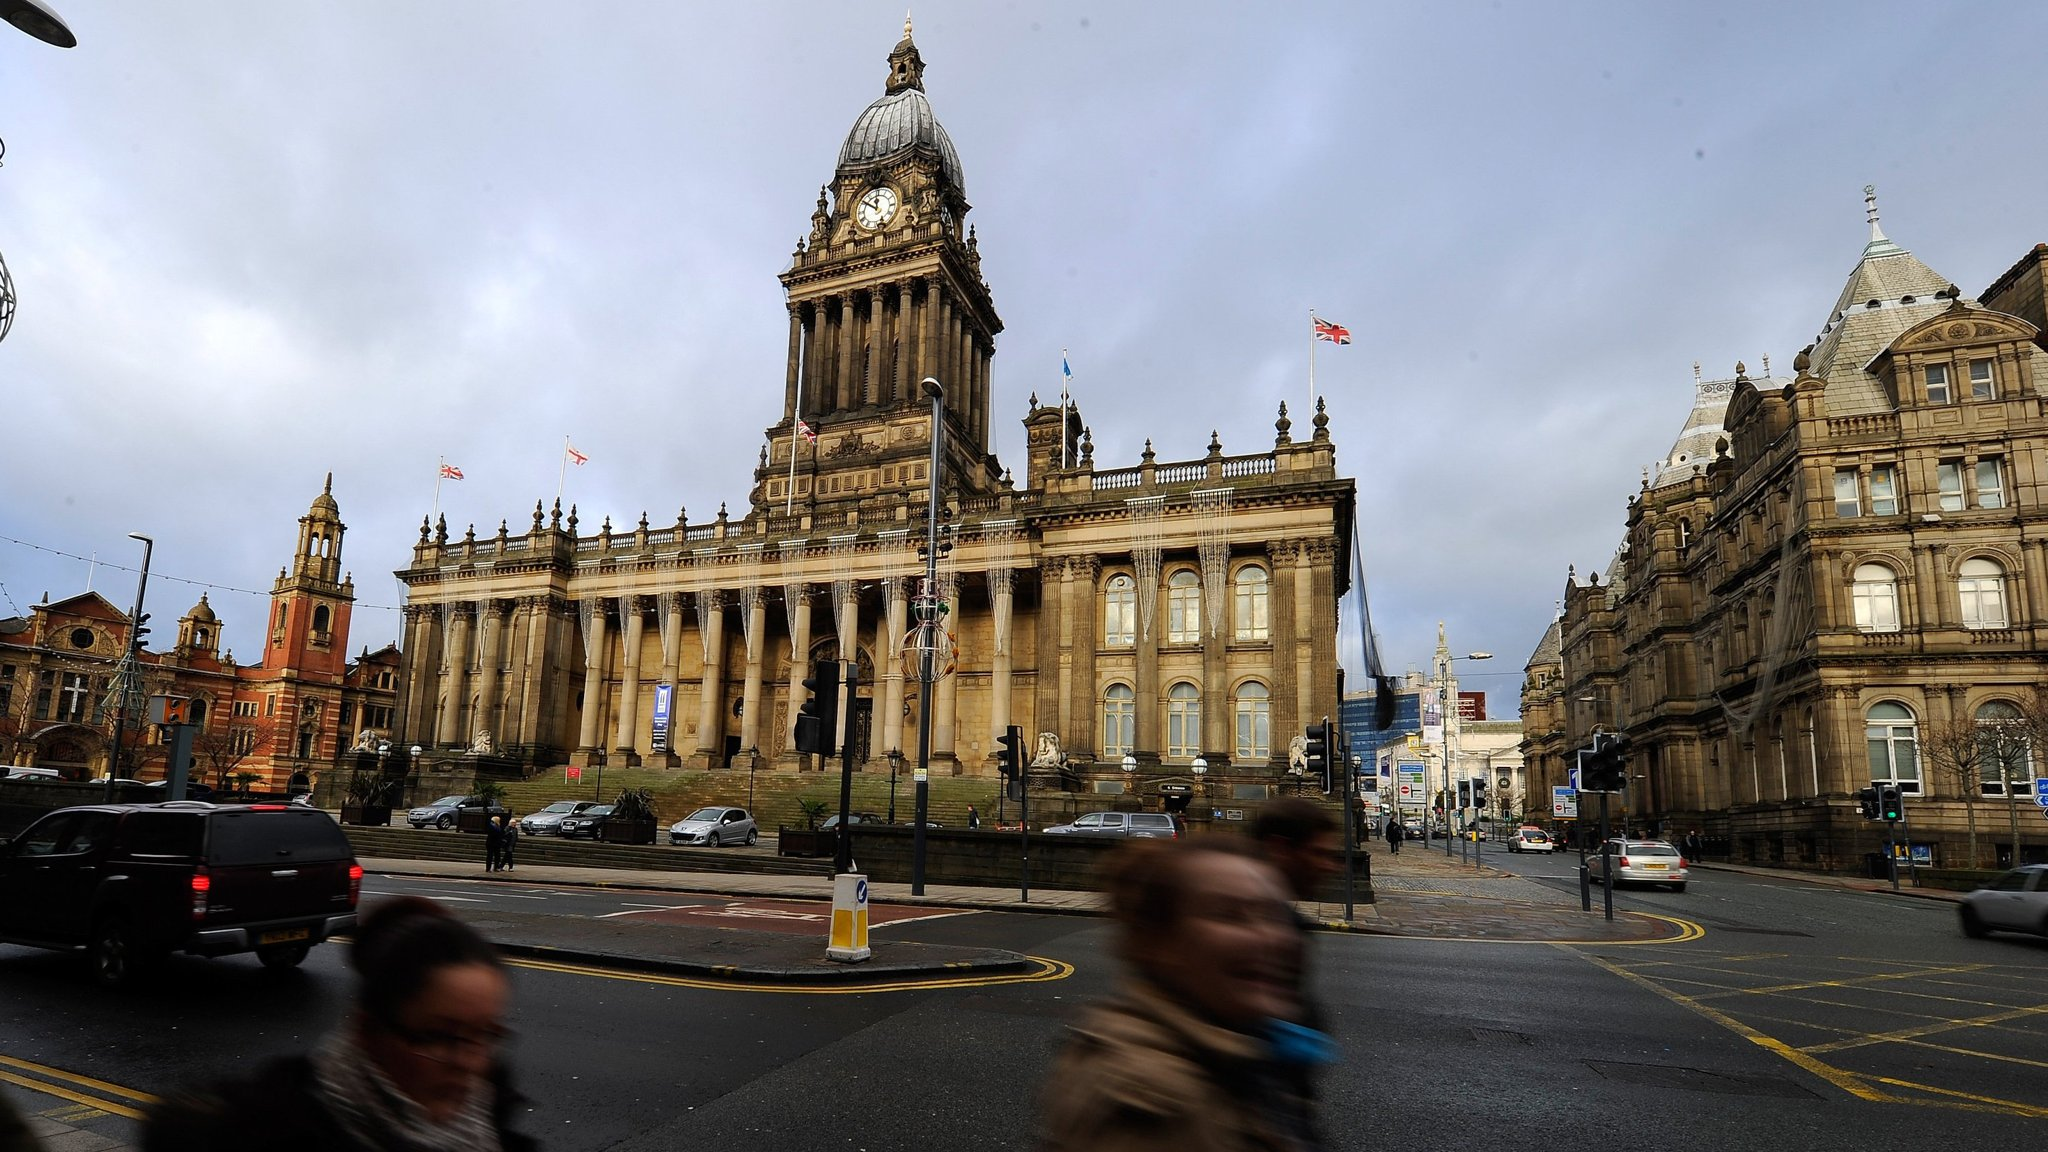 Leeds, England — universities fuel digital powerhouse | Financial Times